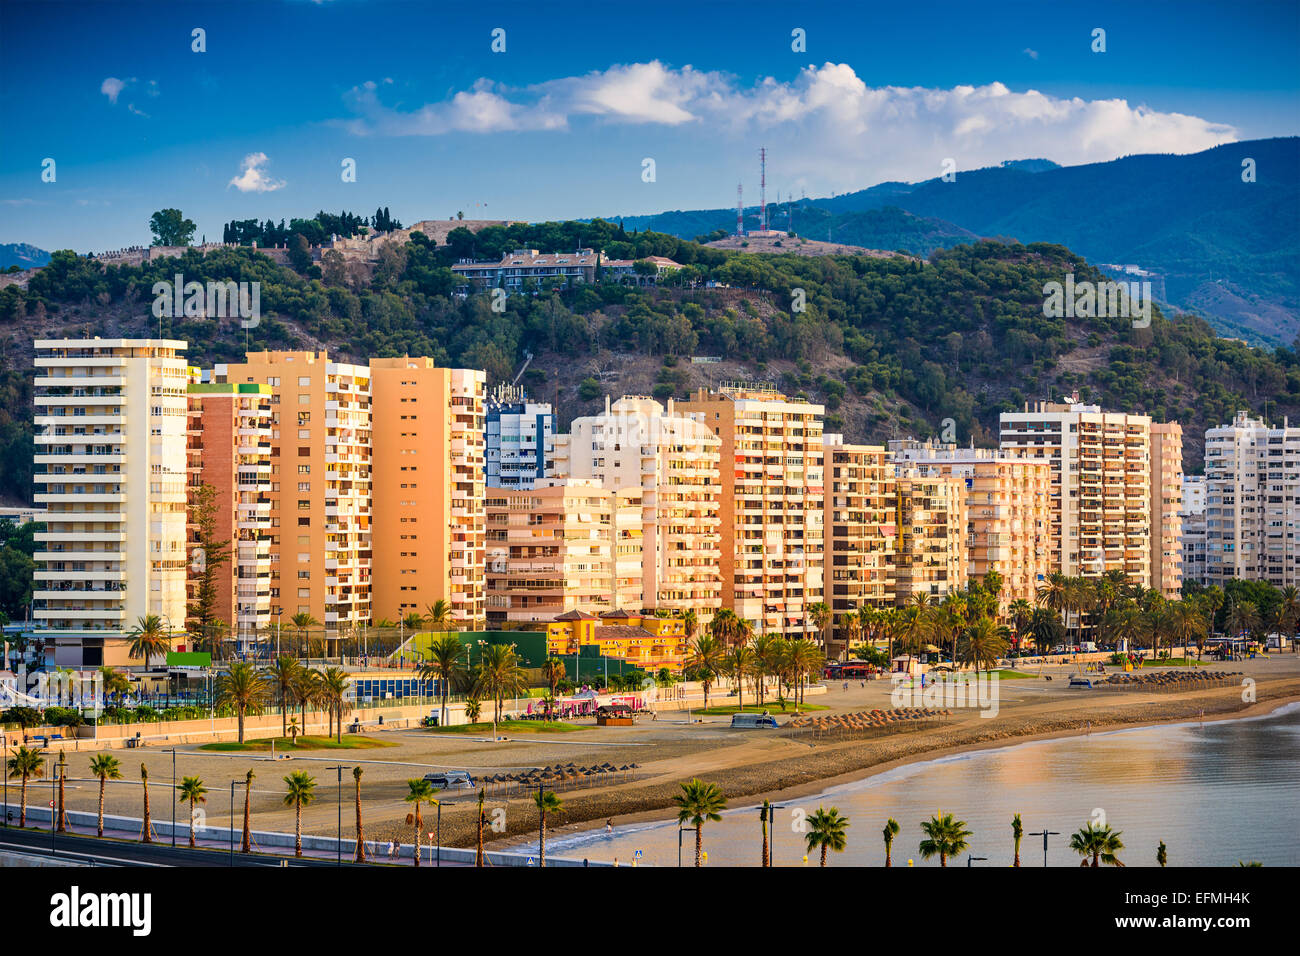 Malaga, Espagne à la plage de Malagueta le long de la Costa del Sol. Photo Stock